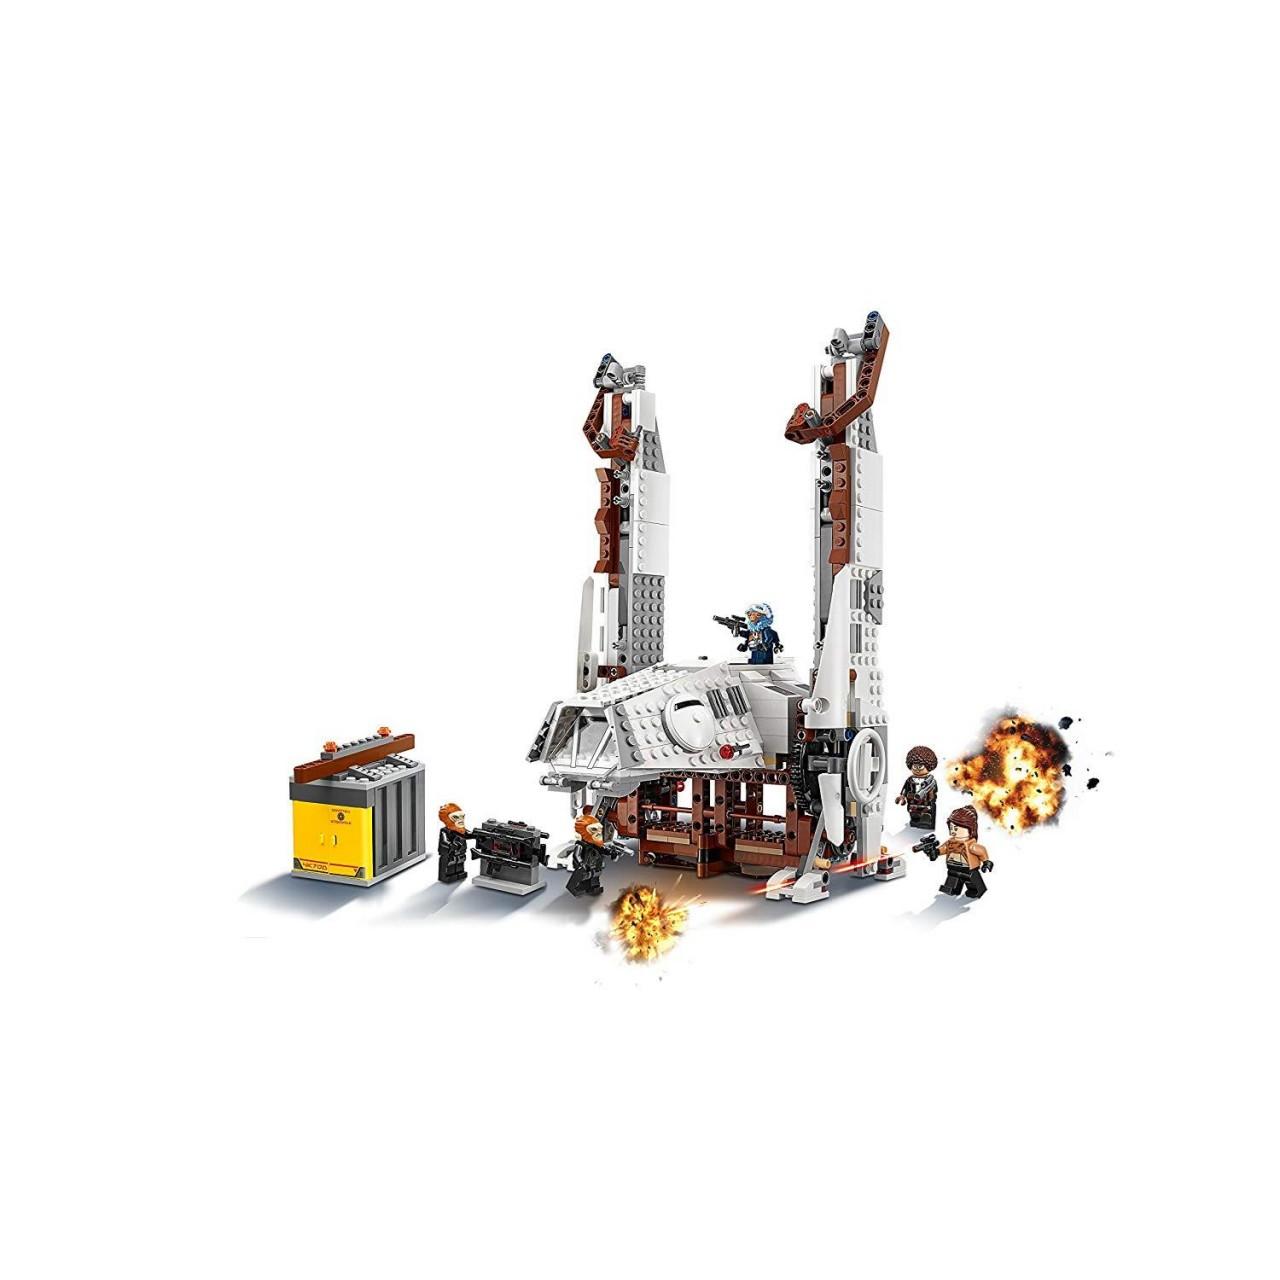 LEGO STAR WARS 75219 Imperial AT-Hauler